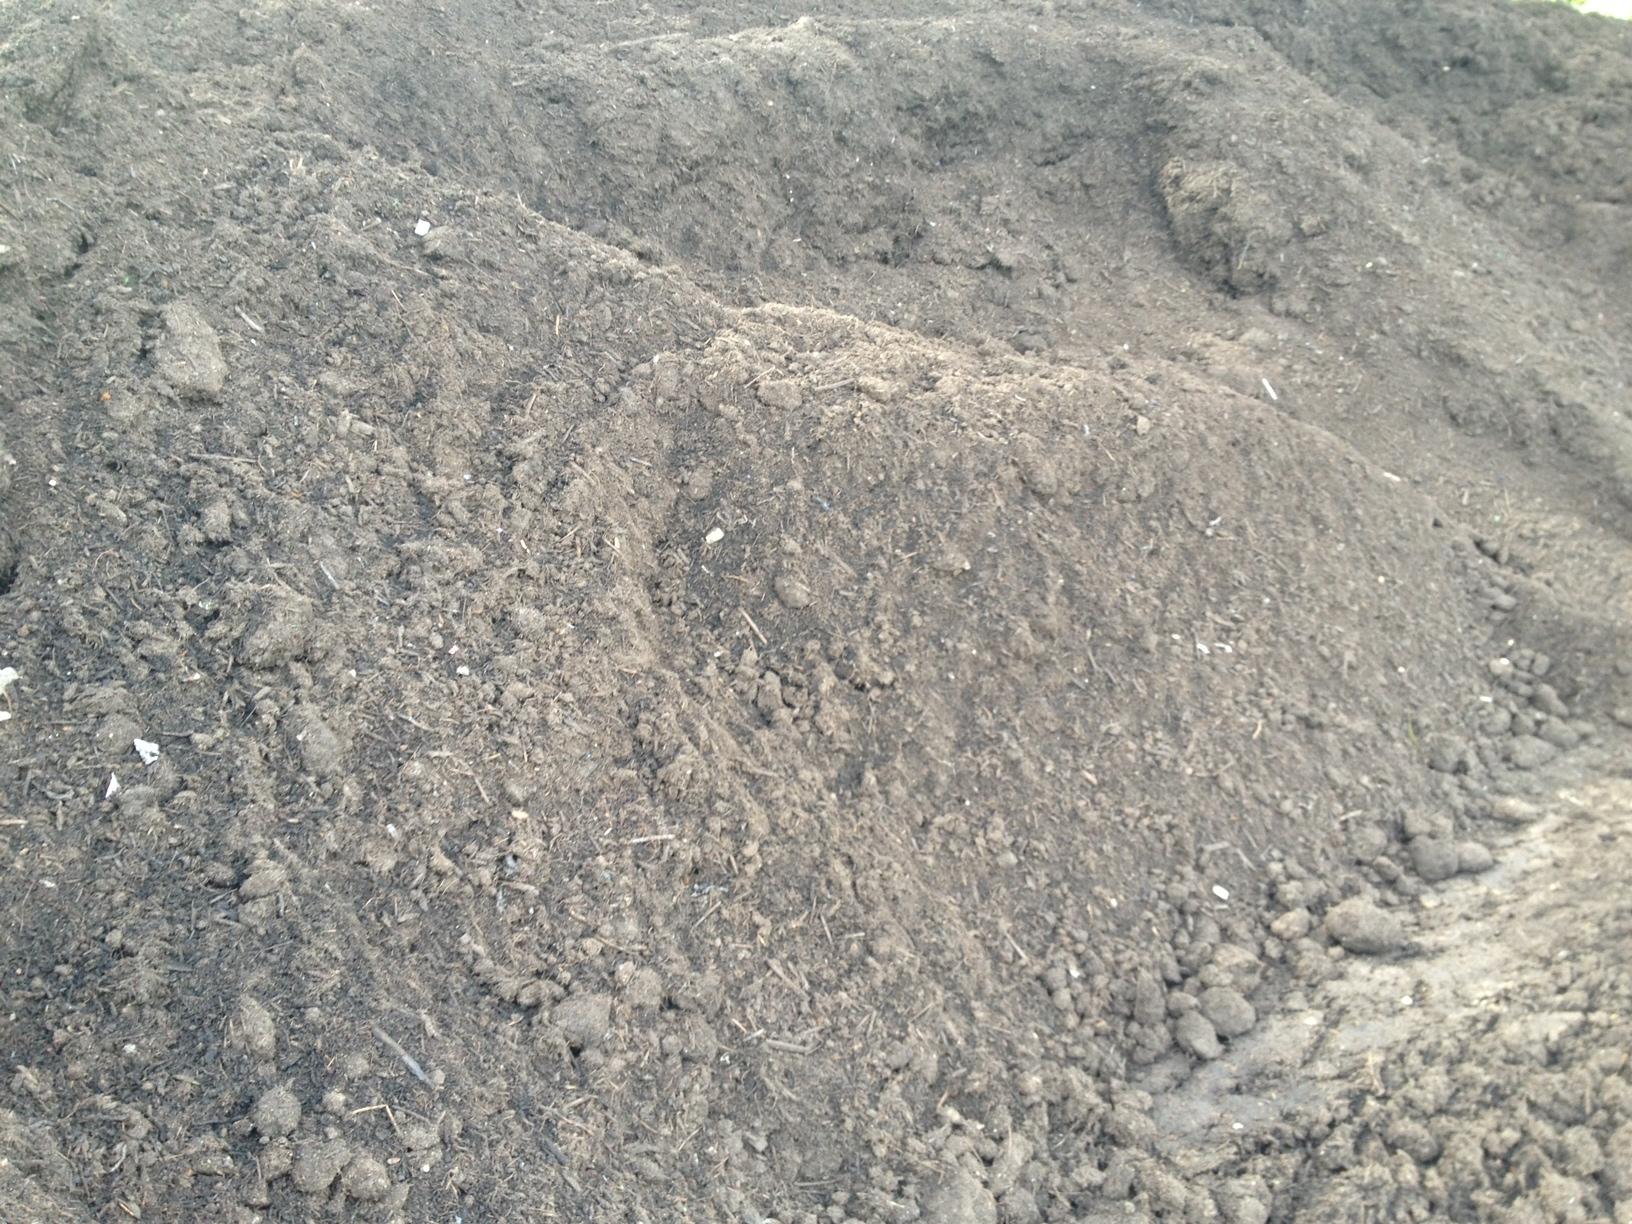 Soils donnellys garden supplies for Organic compost soil